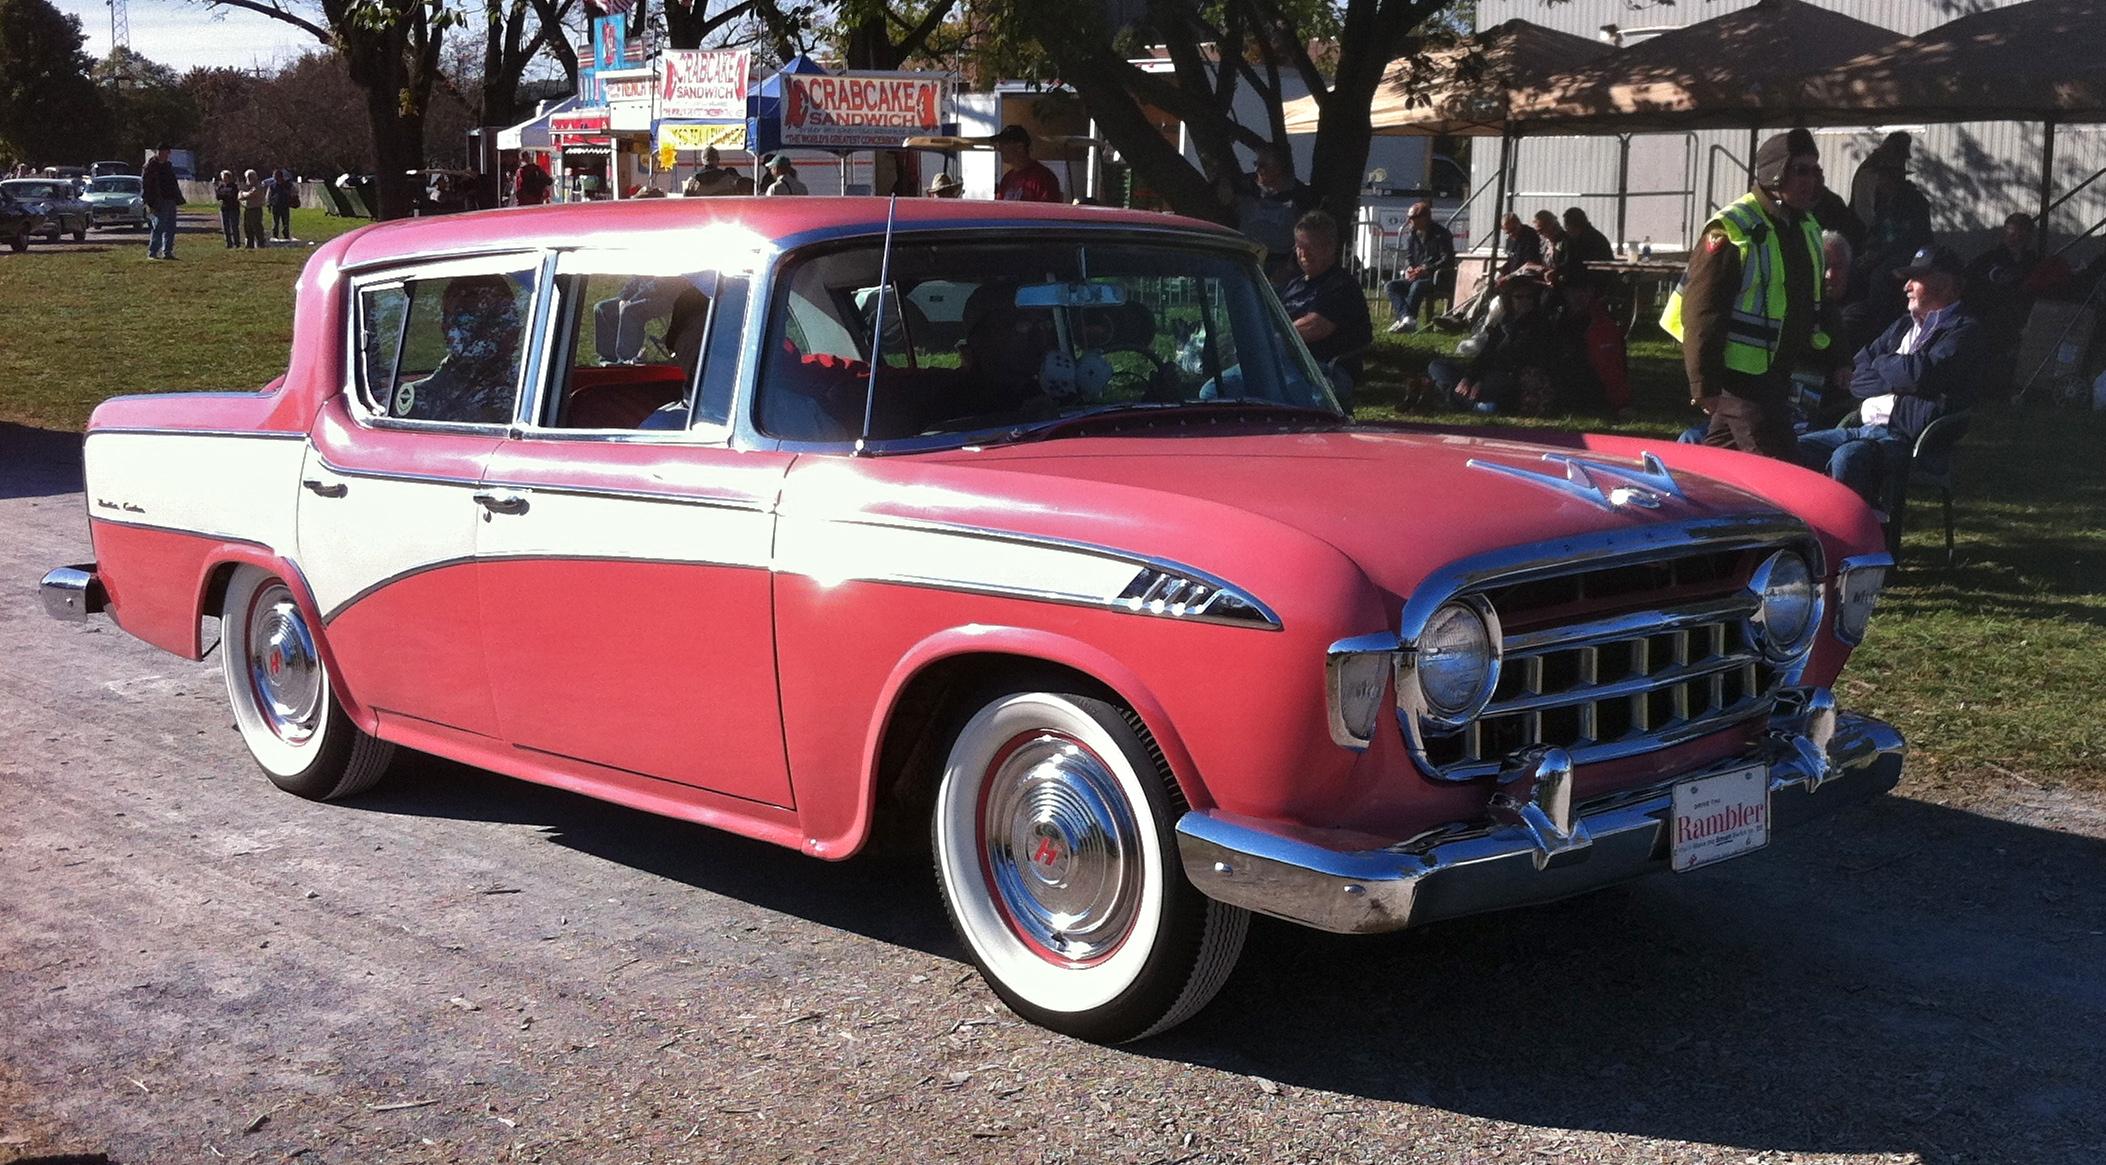 File:1956 Hudson Rambler sedan Hershey 2012 h.jpg - Wikimedia Commons